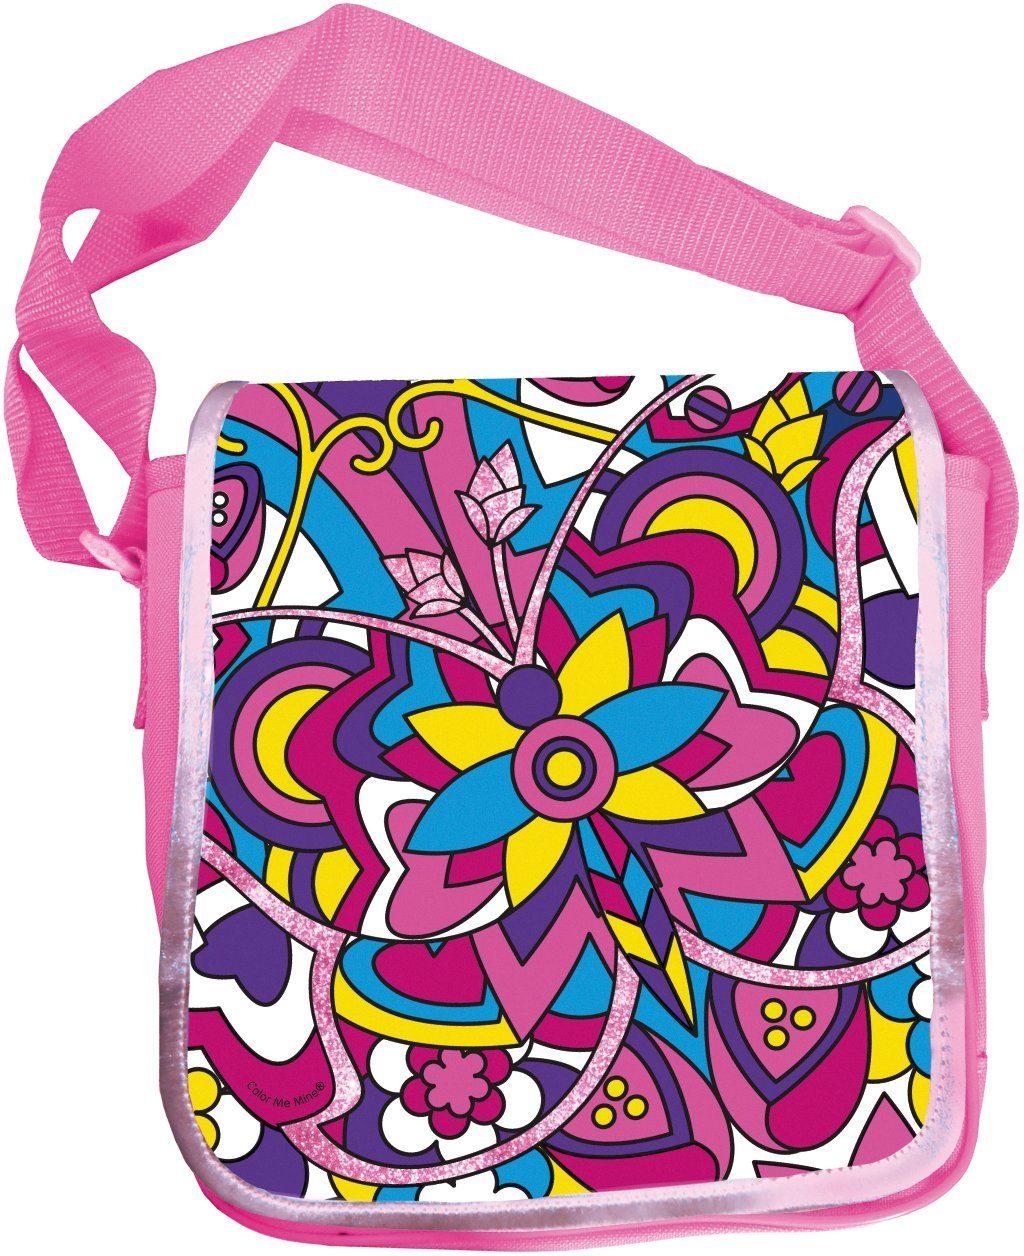 Simba Tasche zum Bemalen, »Color me mine, Diamond Party Messenger Bag«